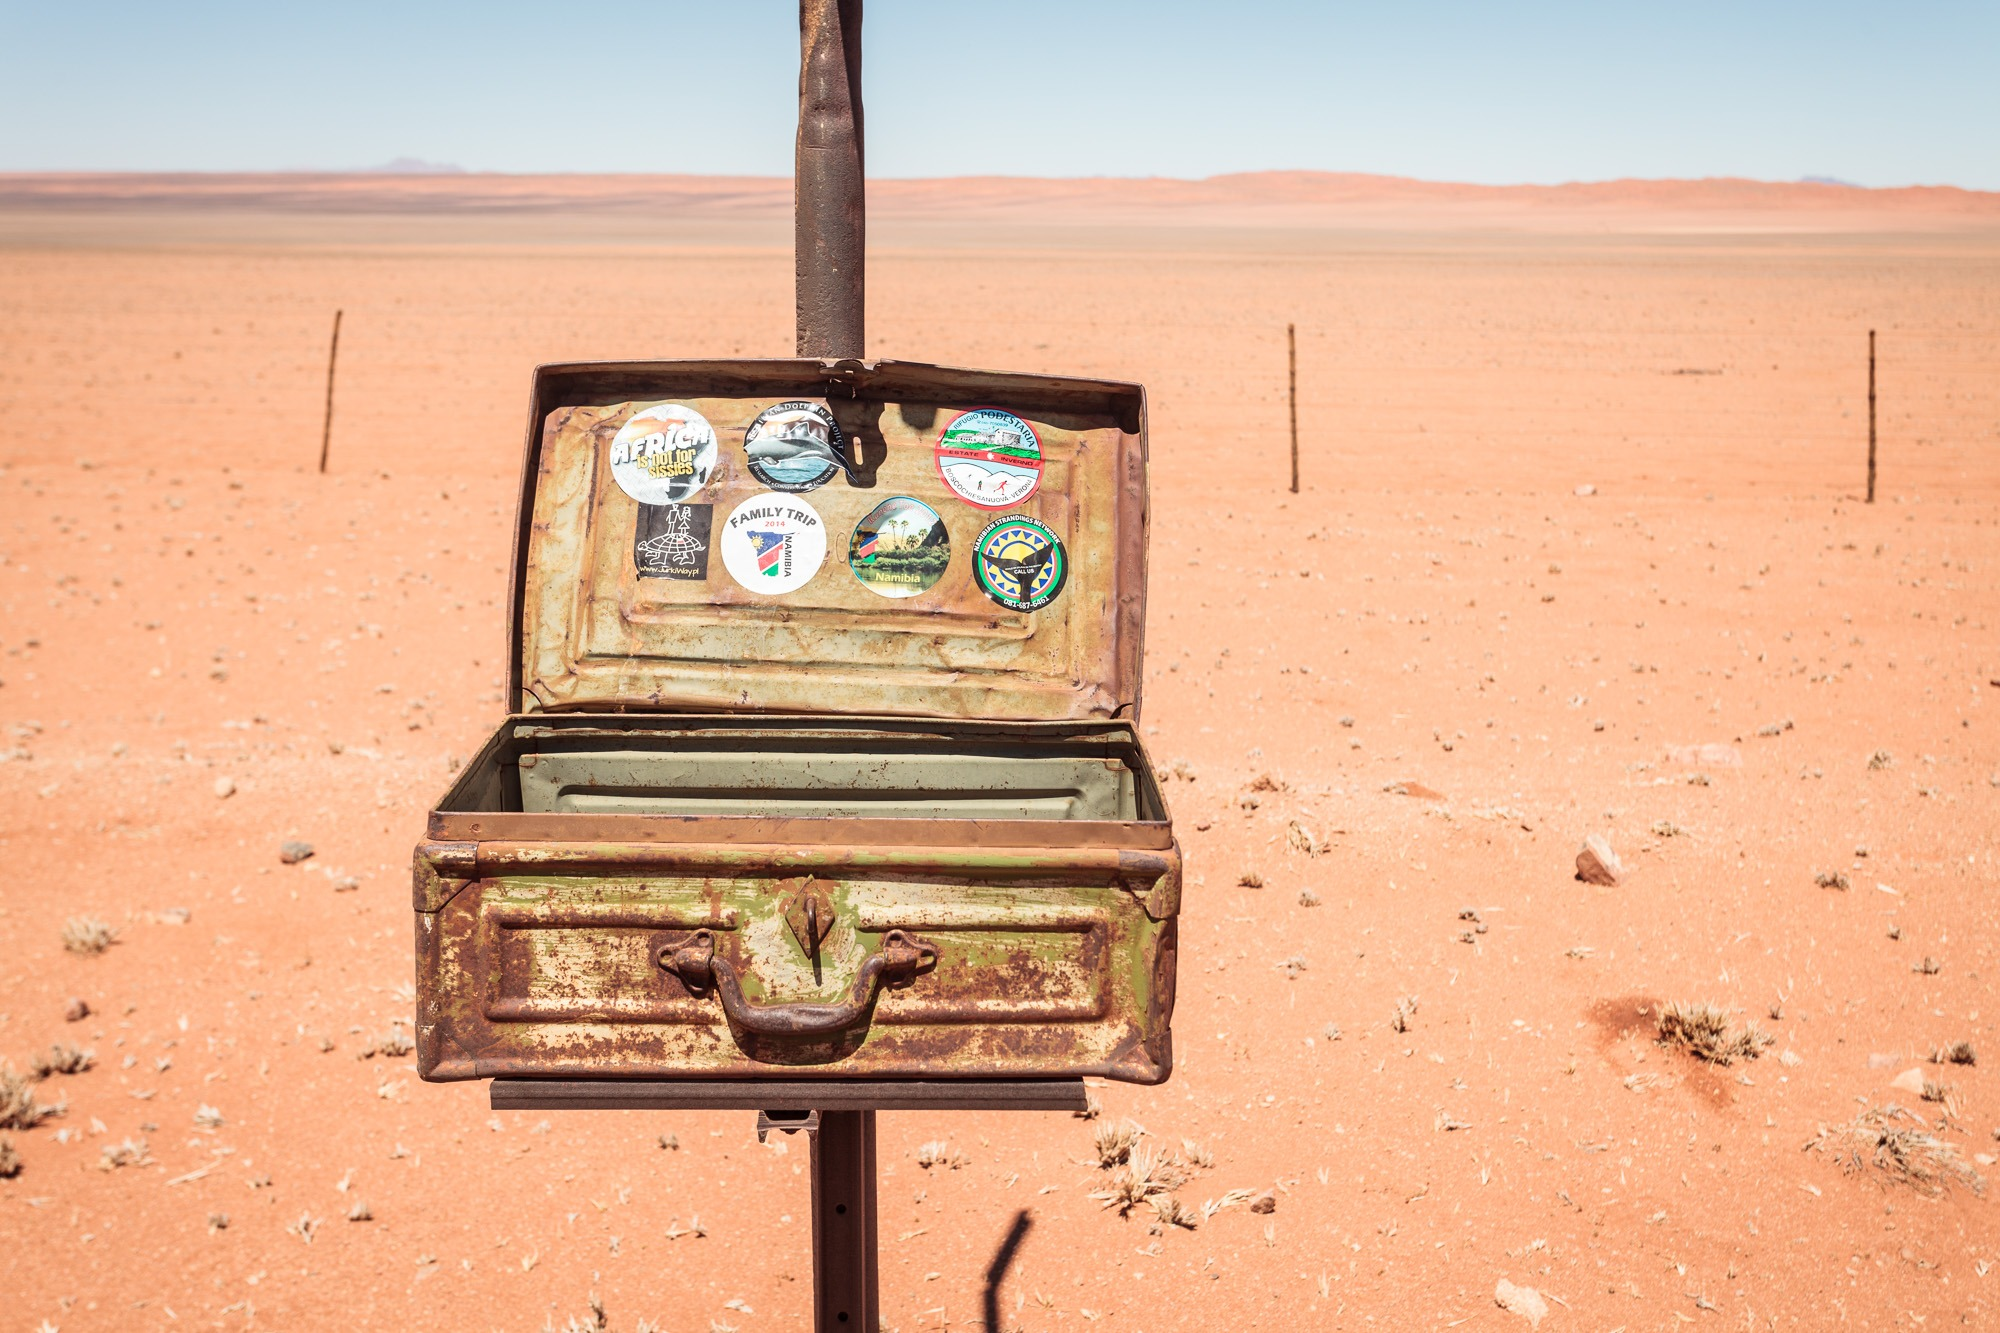 Offener Koffer in der Namib Wüste Namibia